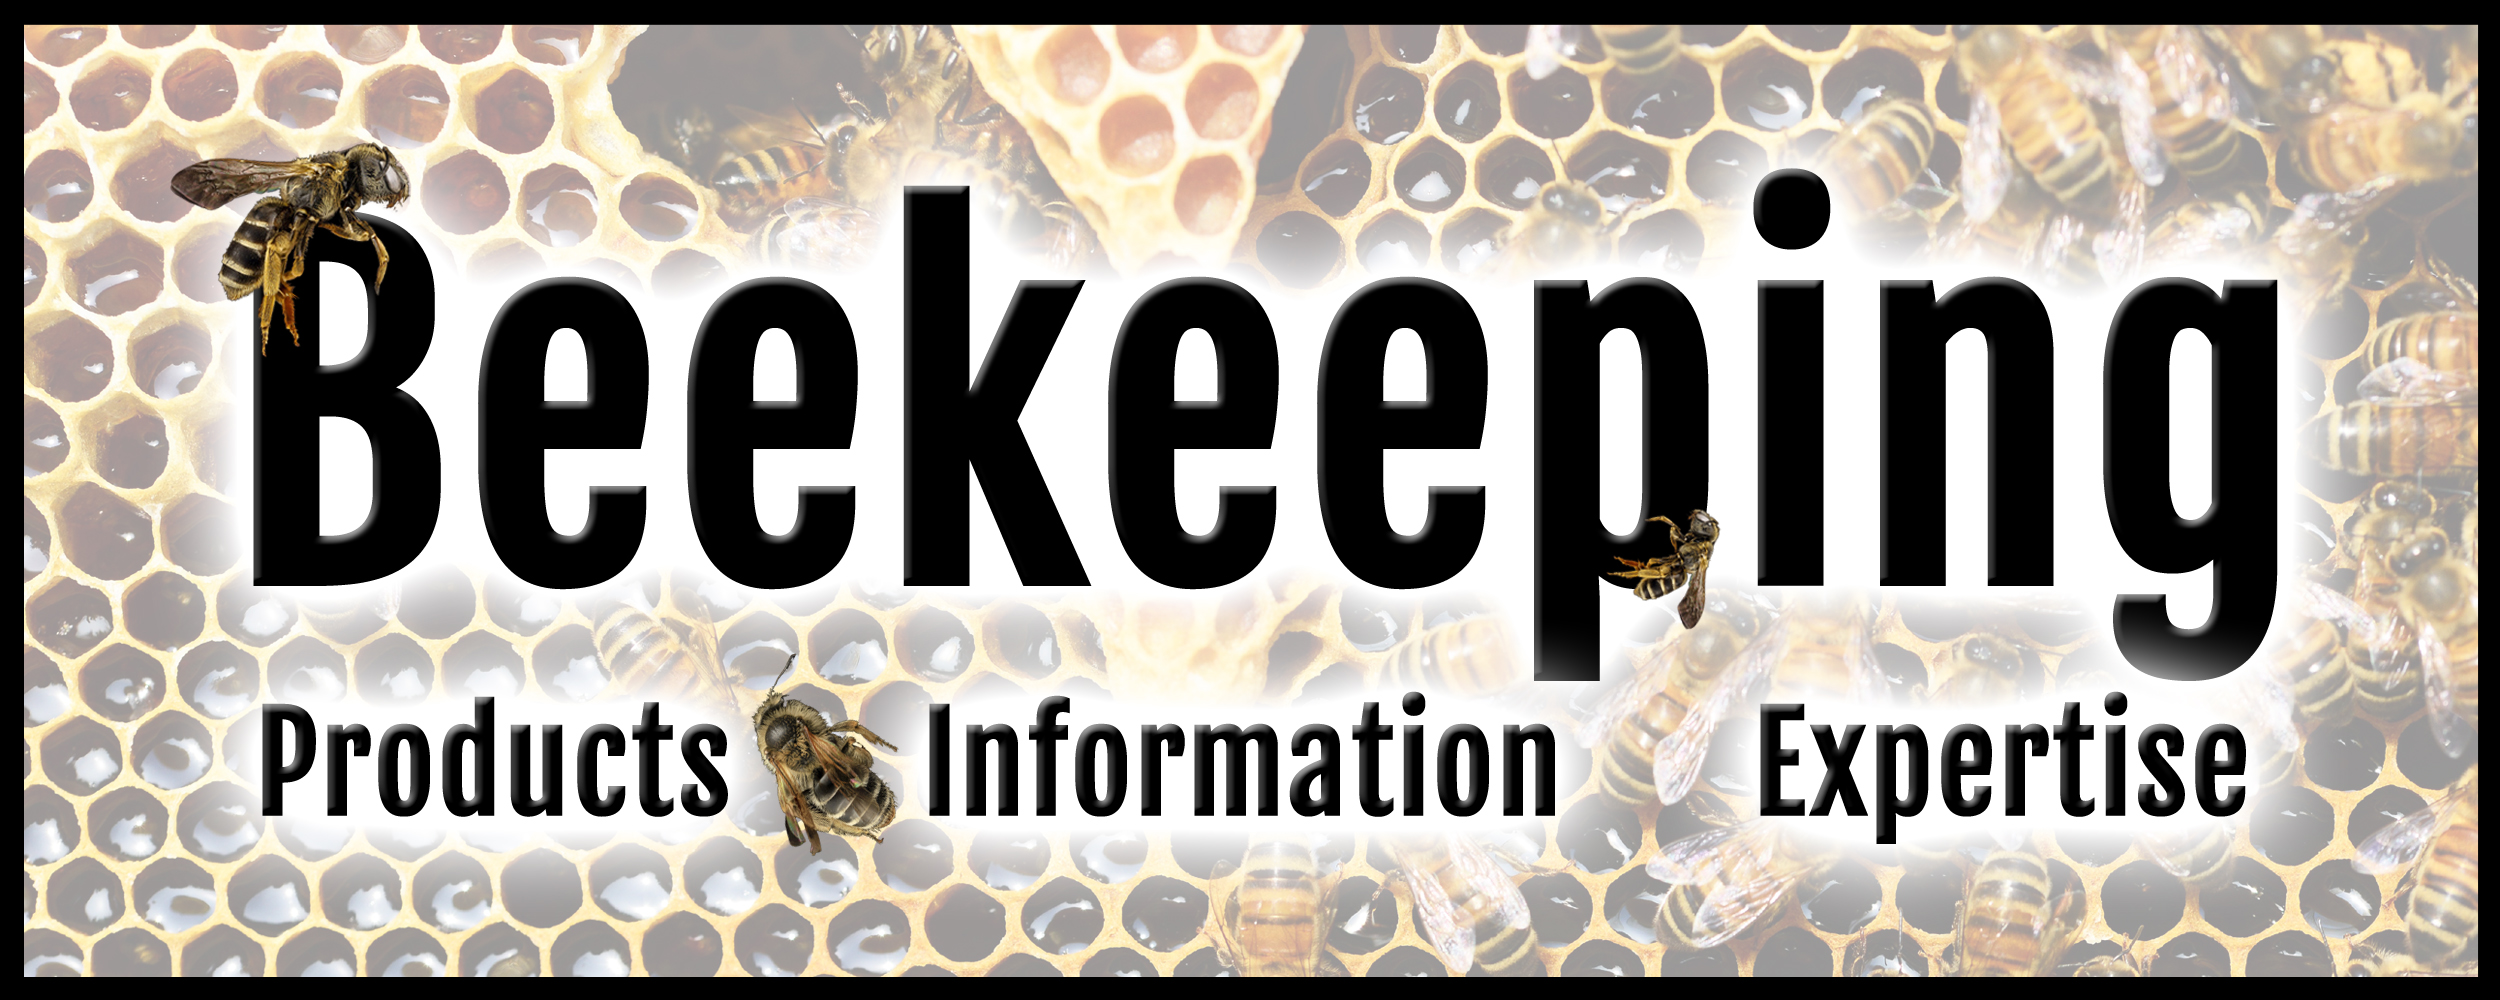 beekeeping banner v2.jpg